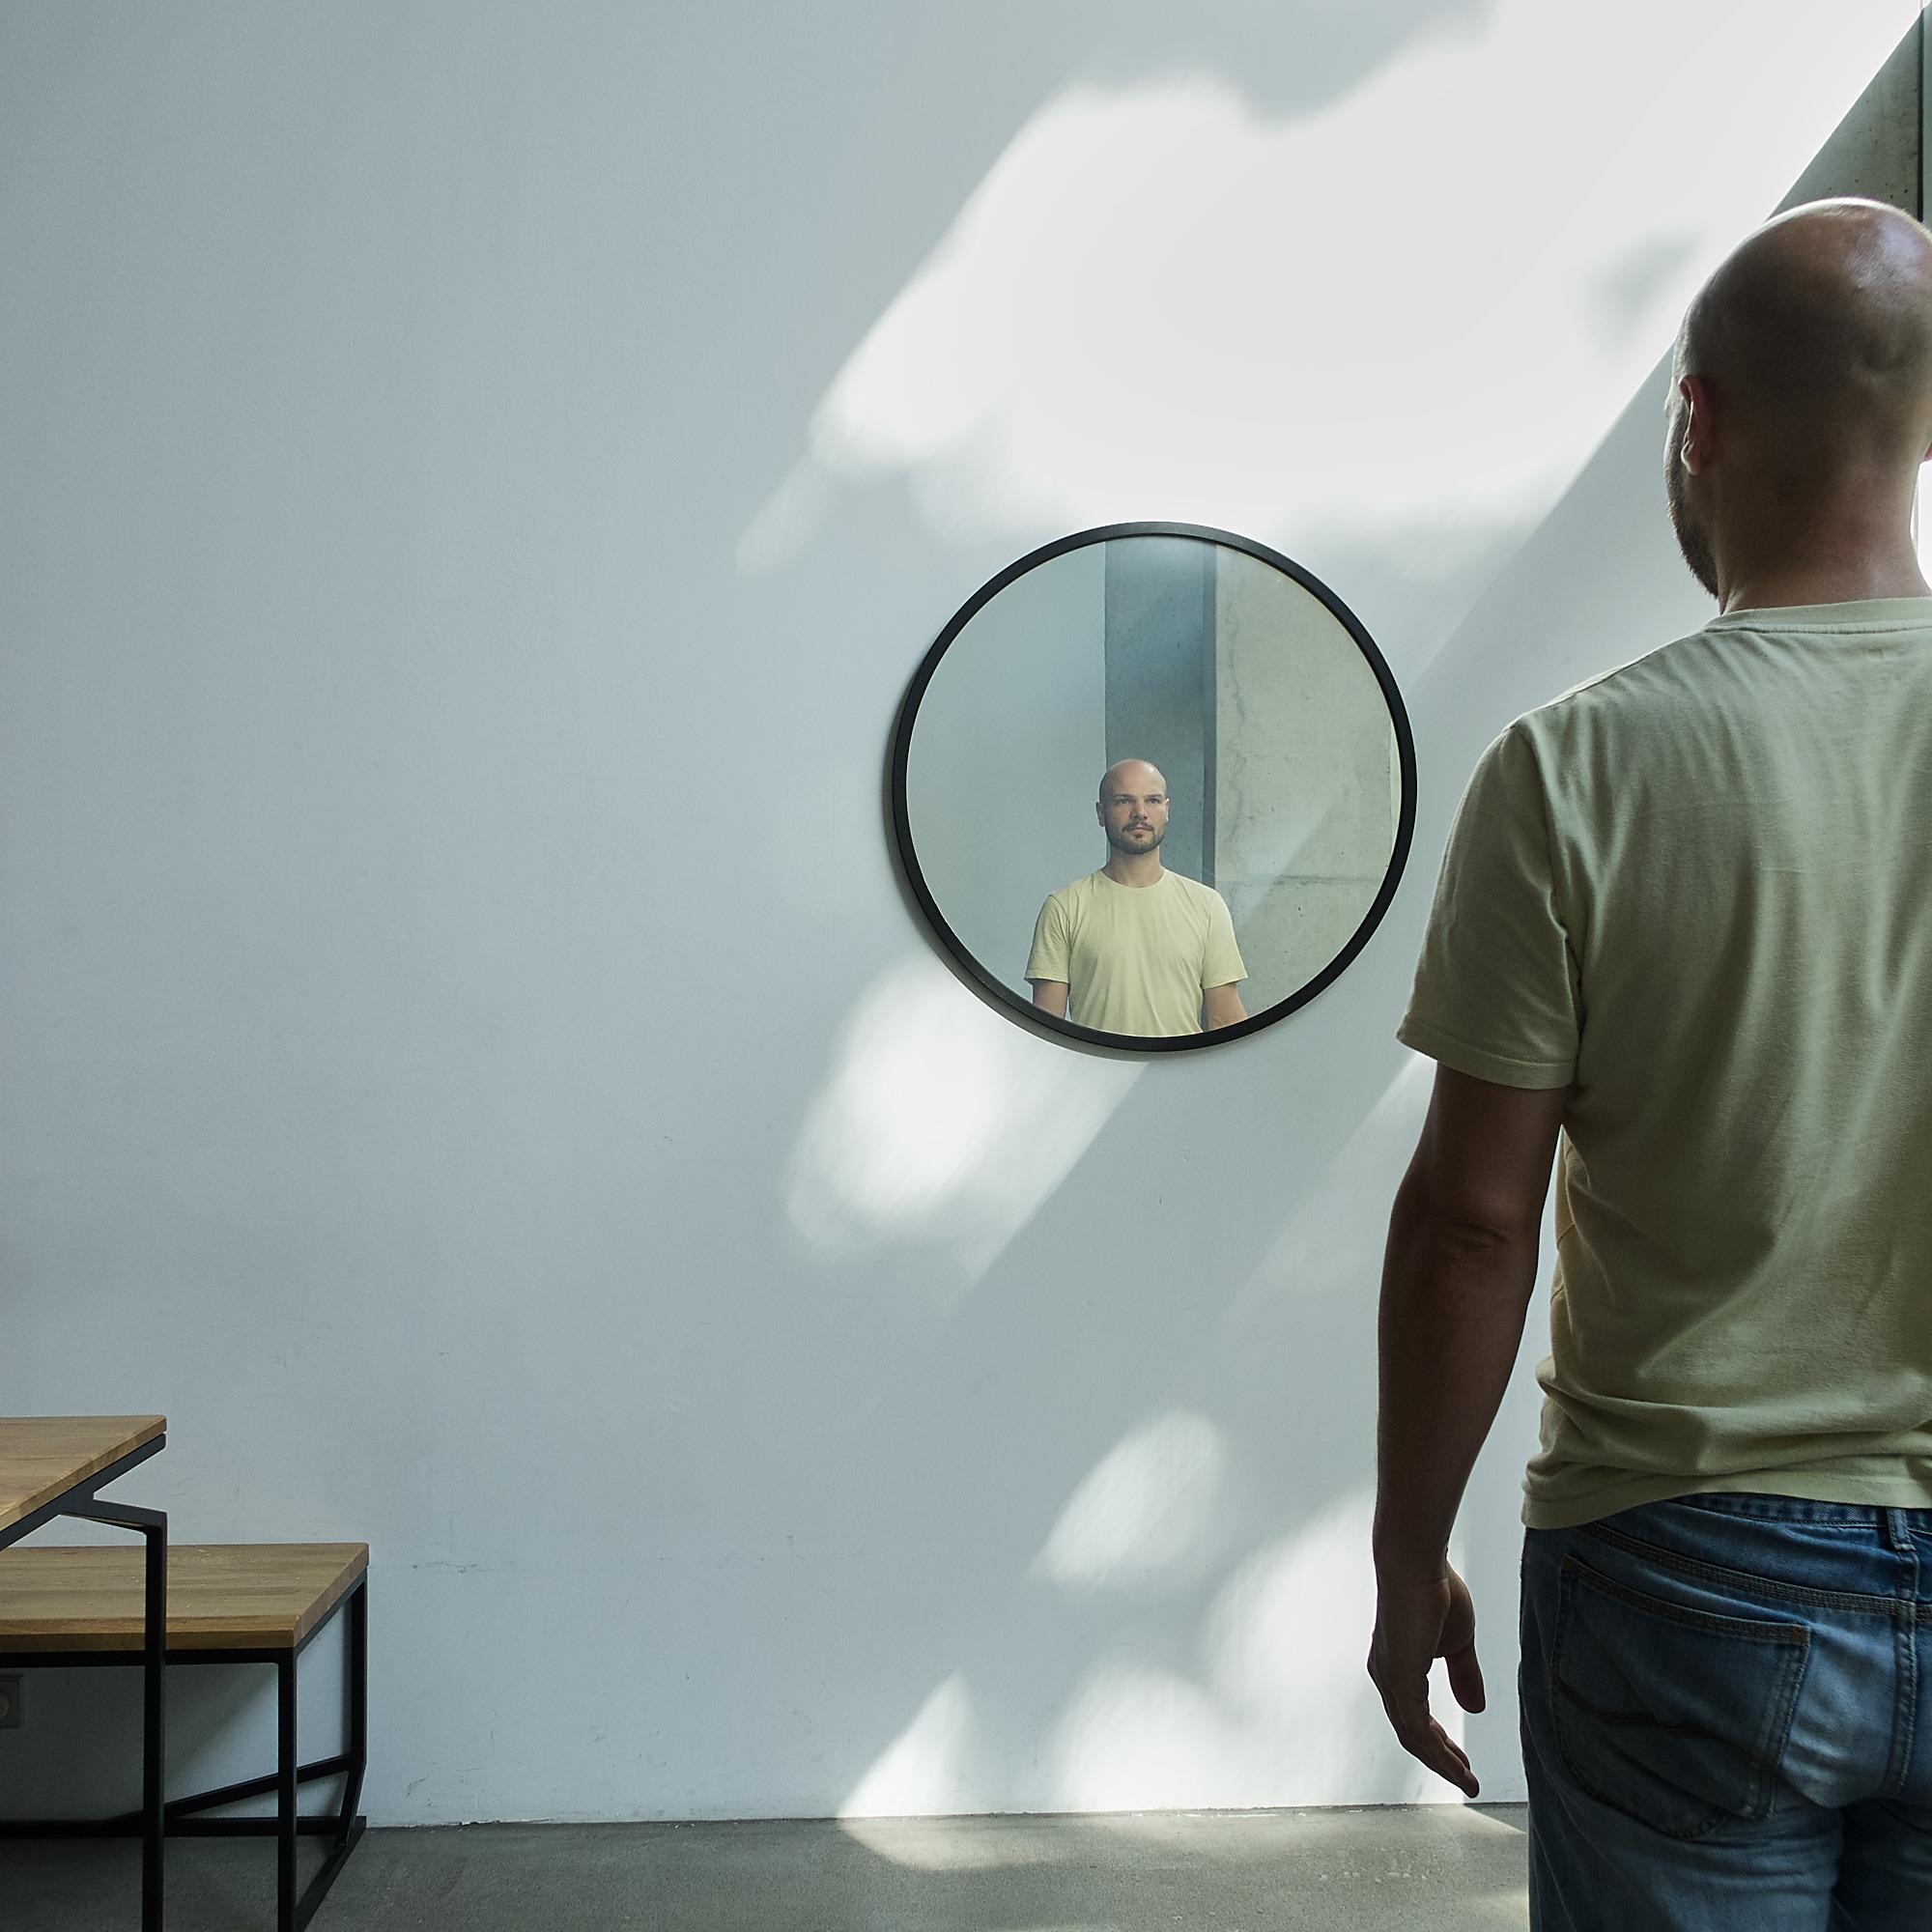 rlon-pranayama-kinetic-art-installation-1564.jpg